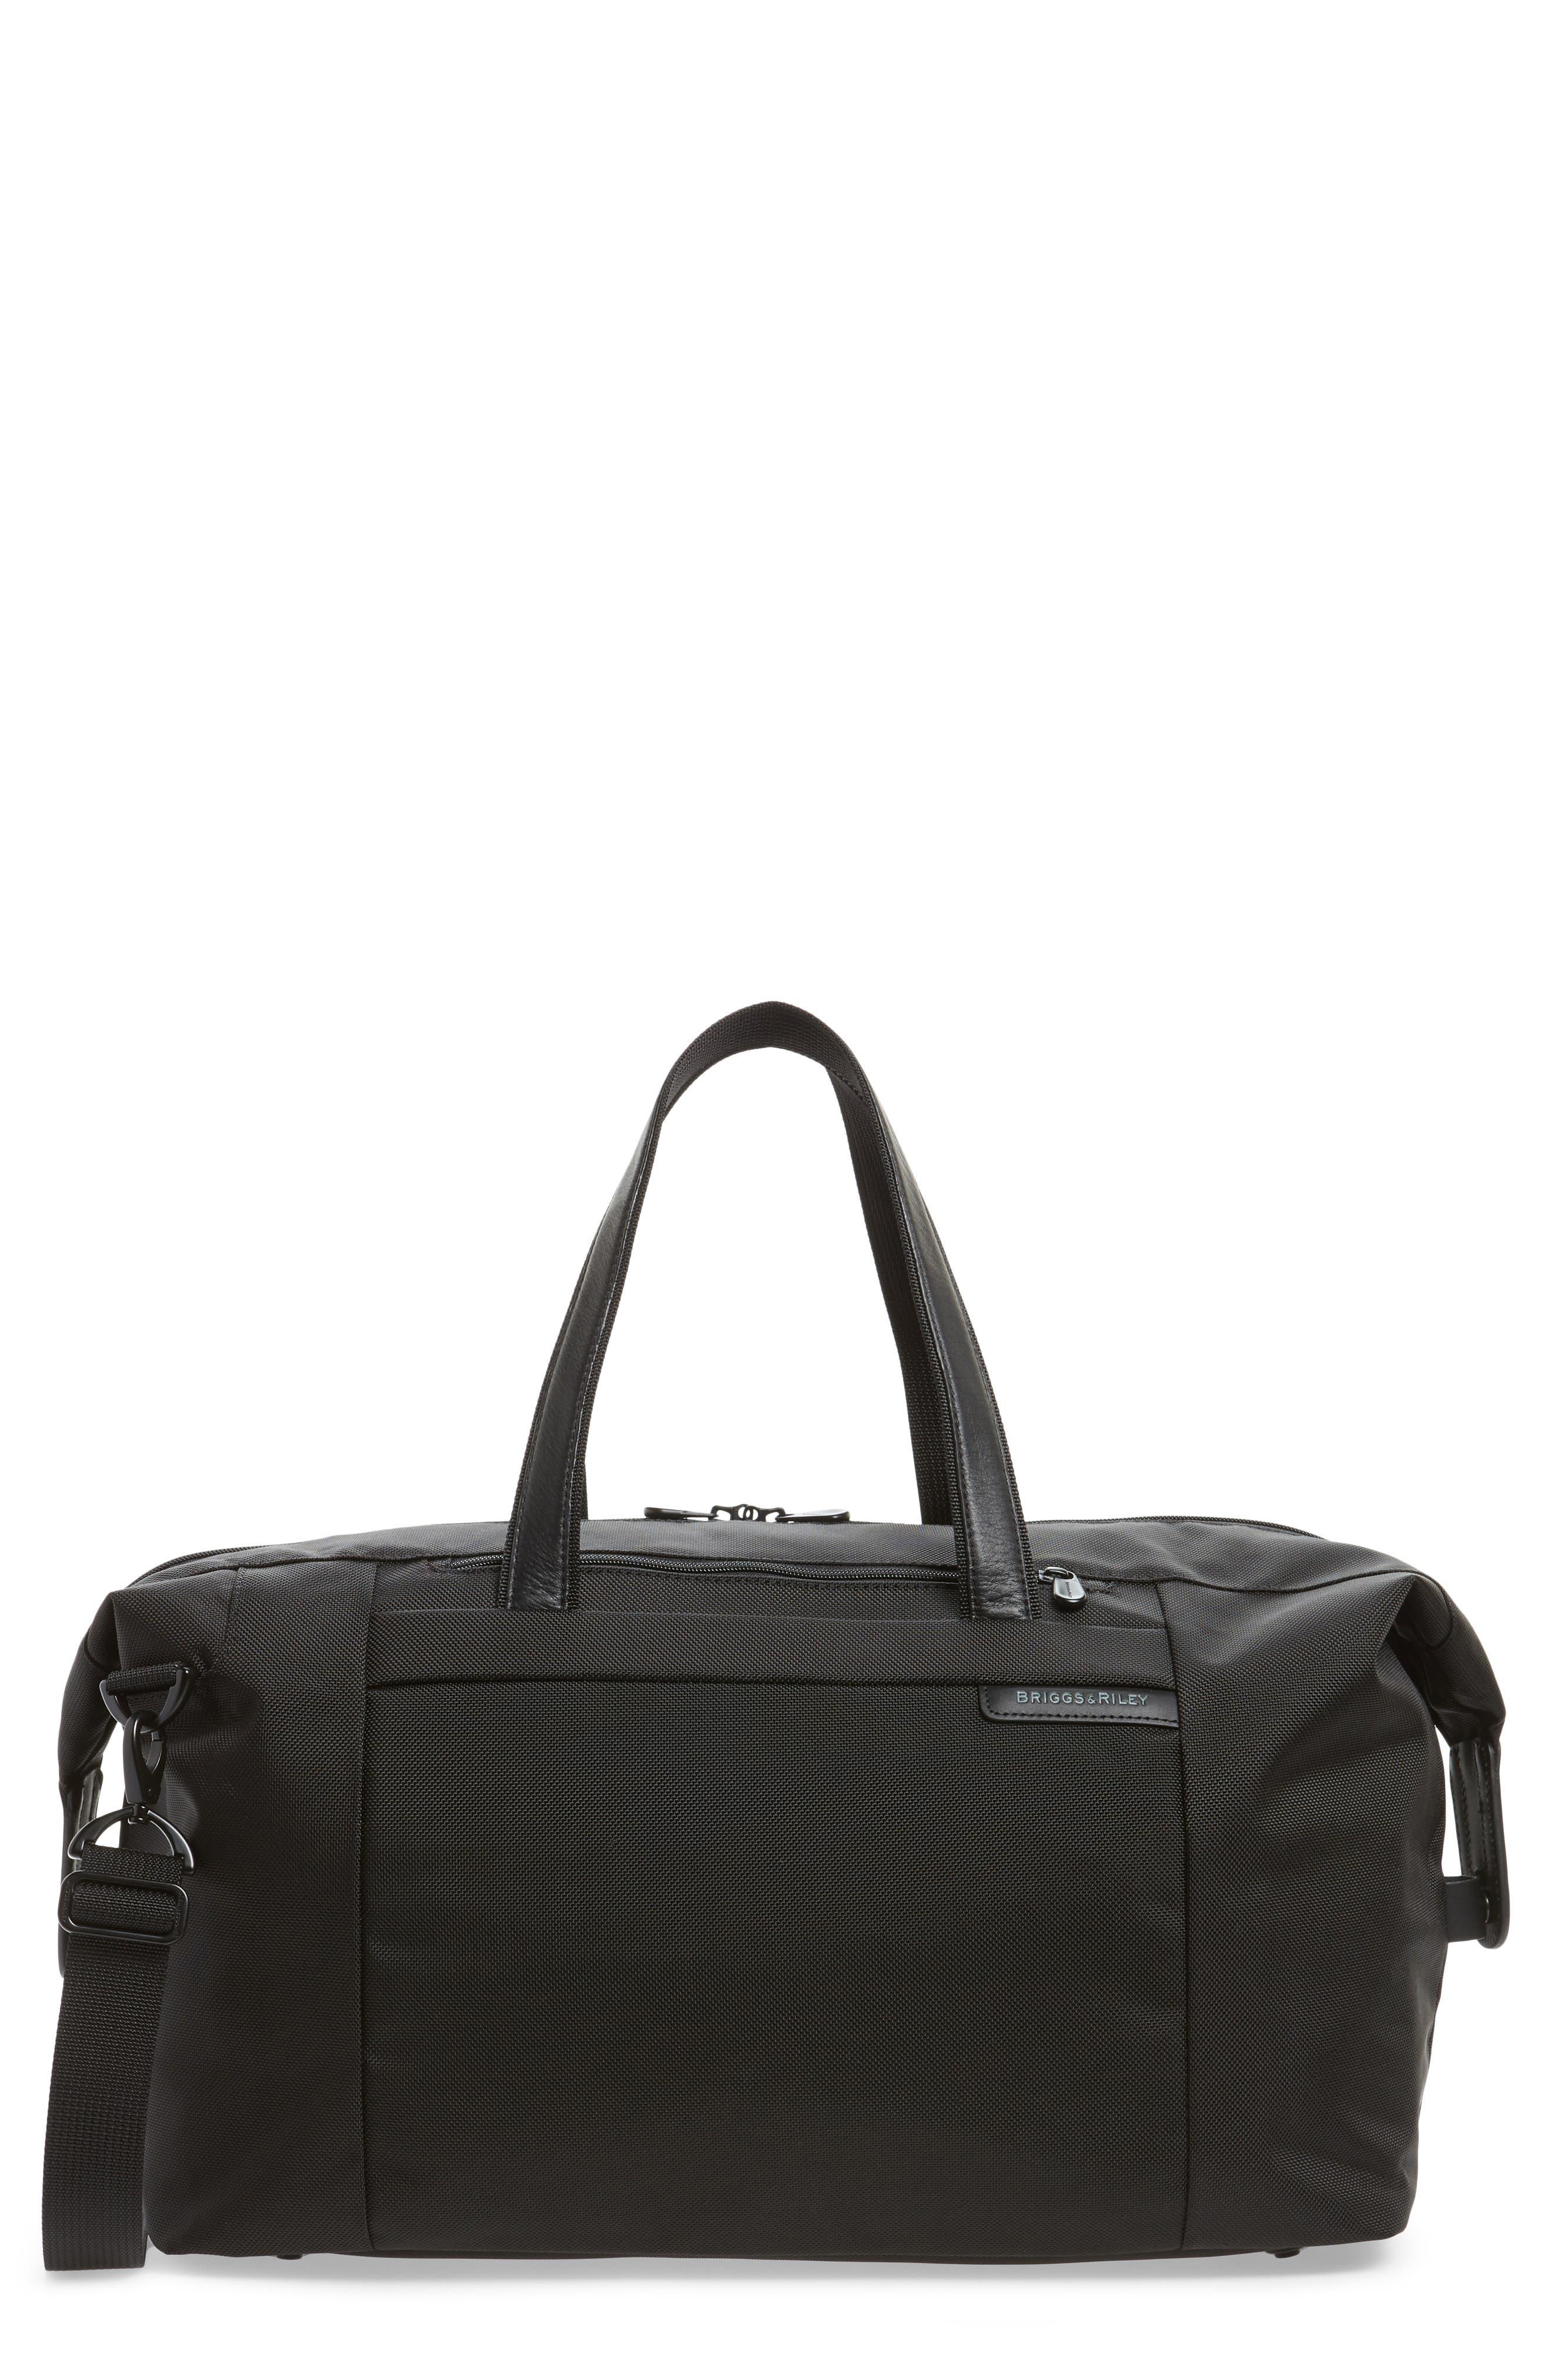 BRIGGS & RILEY,                             'Baseline' Duffel Bag,                             Main thumbnail 1, color,                             BLACK